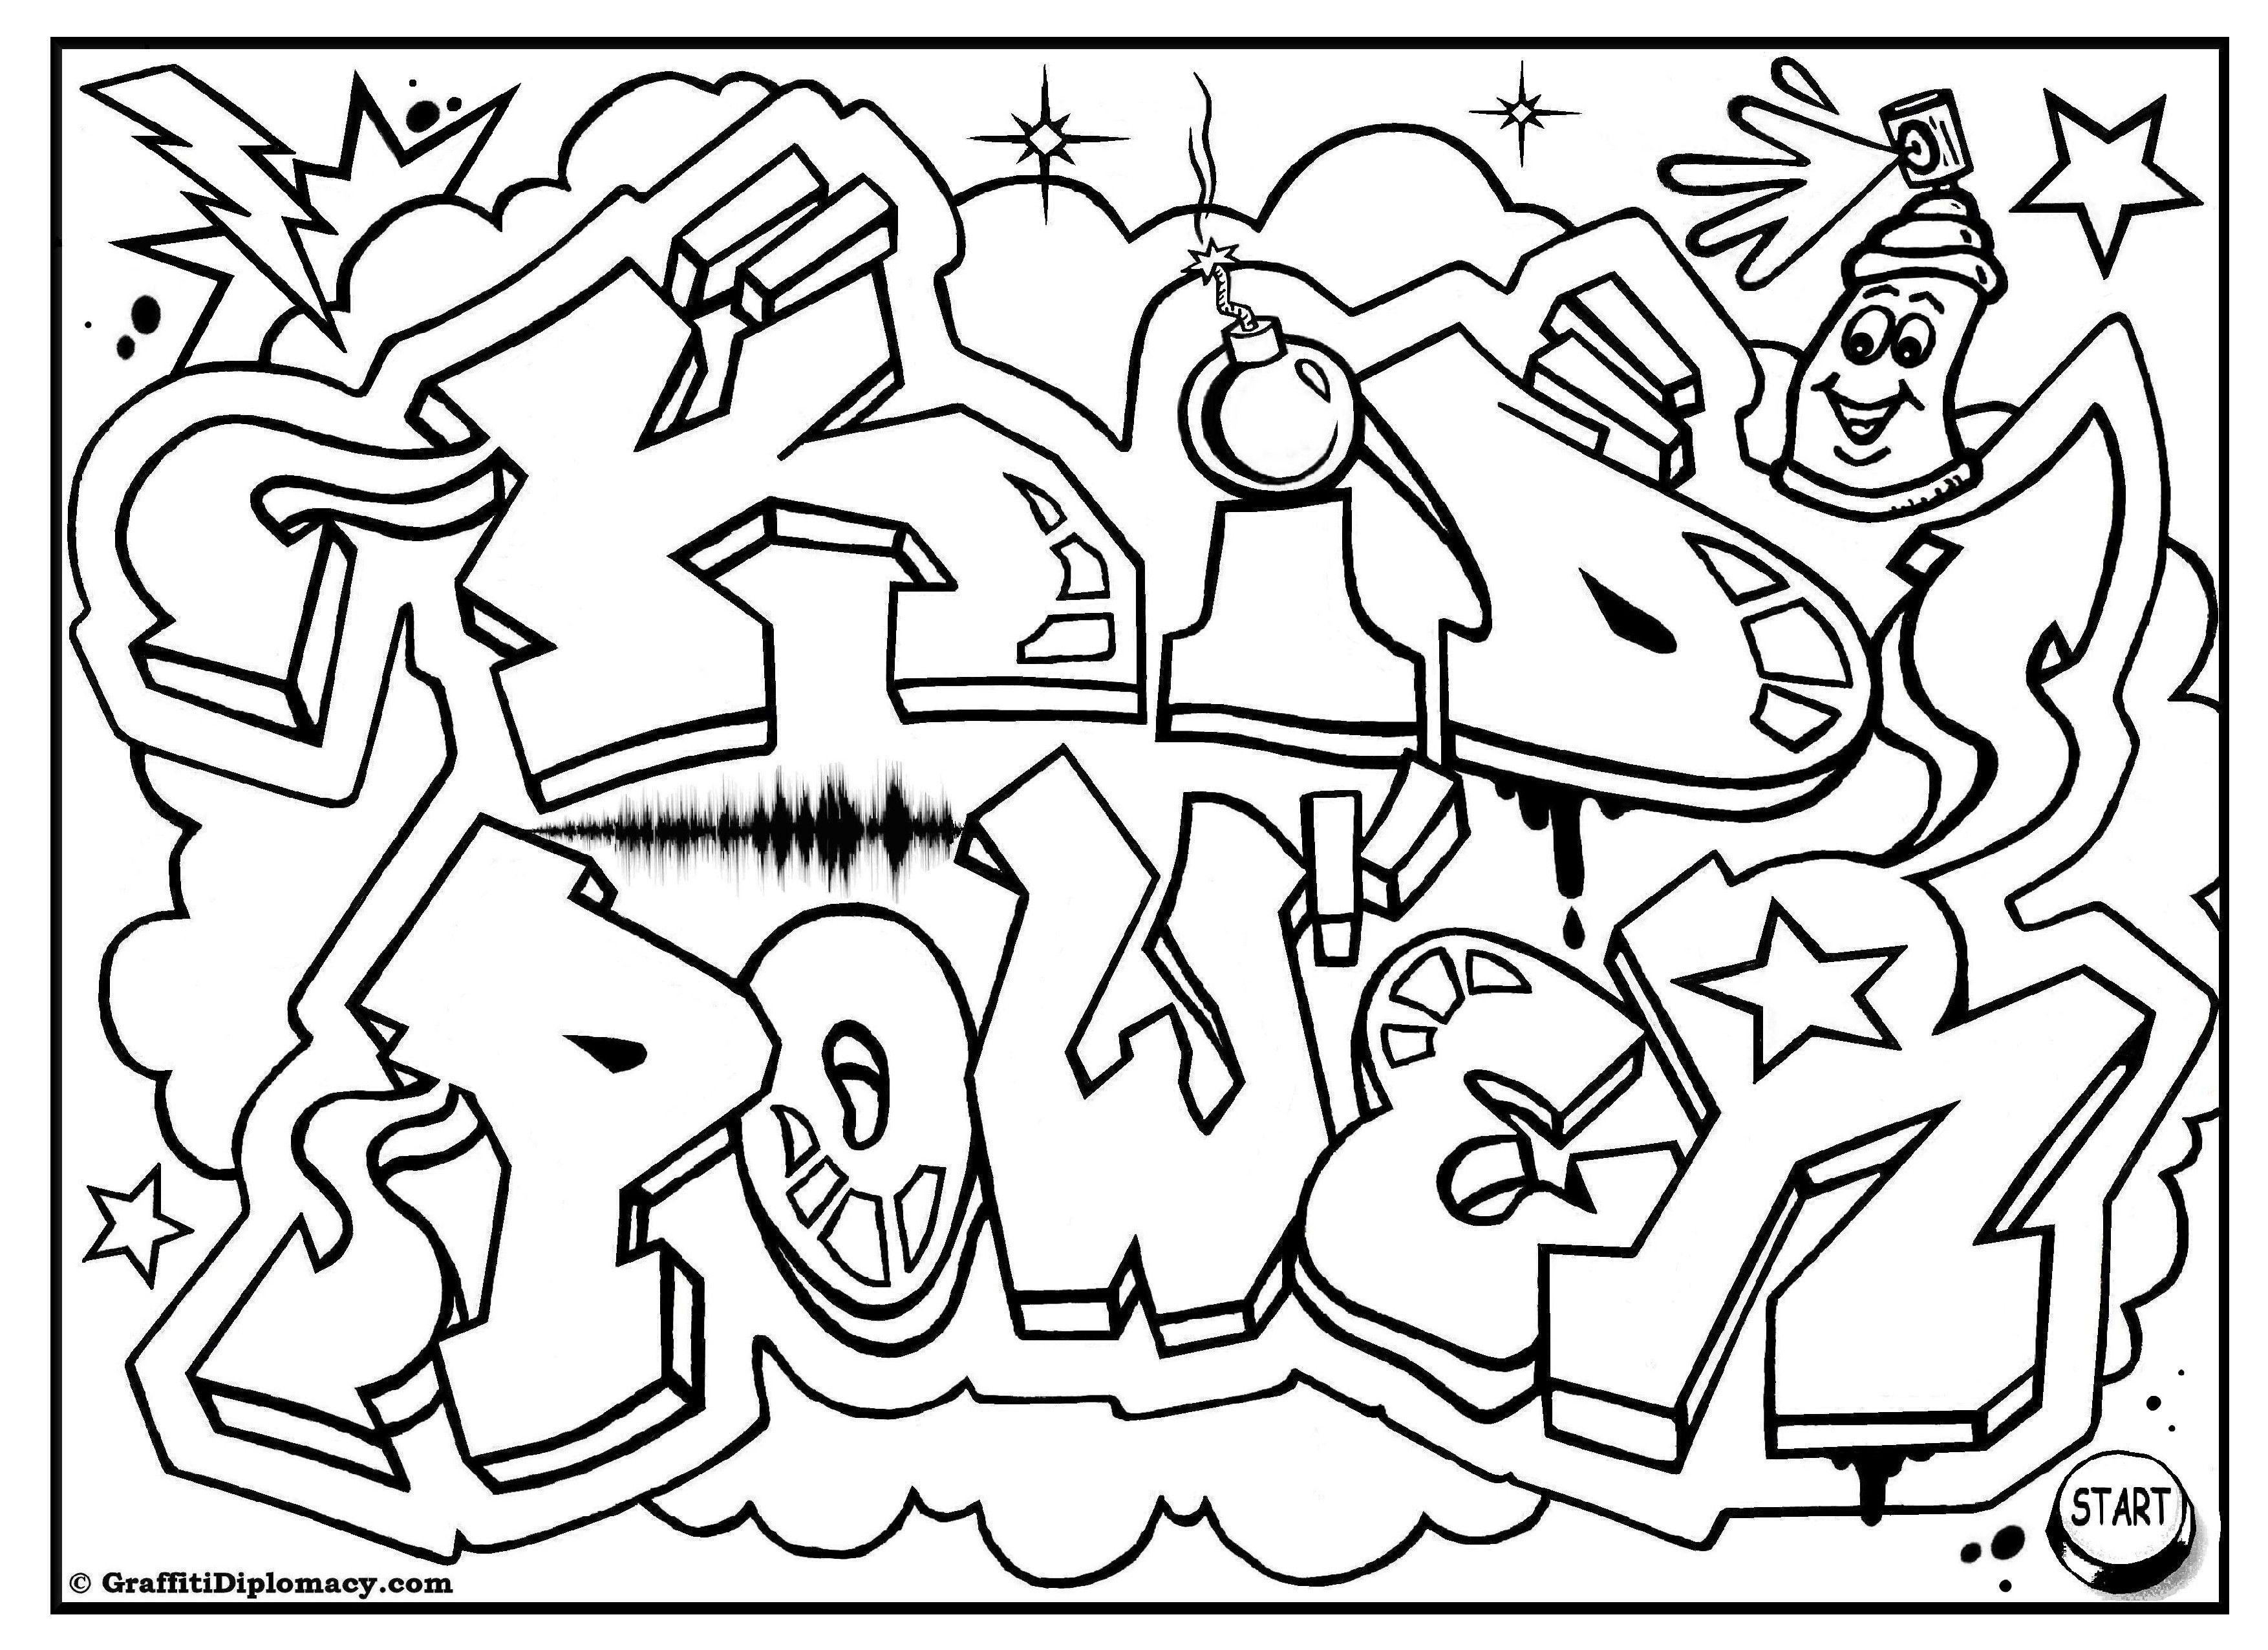 Kid Power Free Graffiti Coloring Page Free Printable